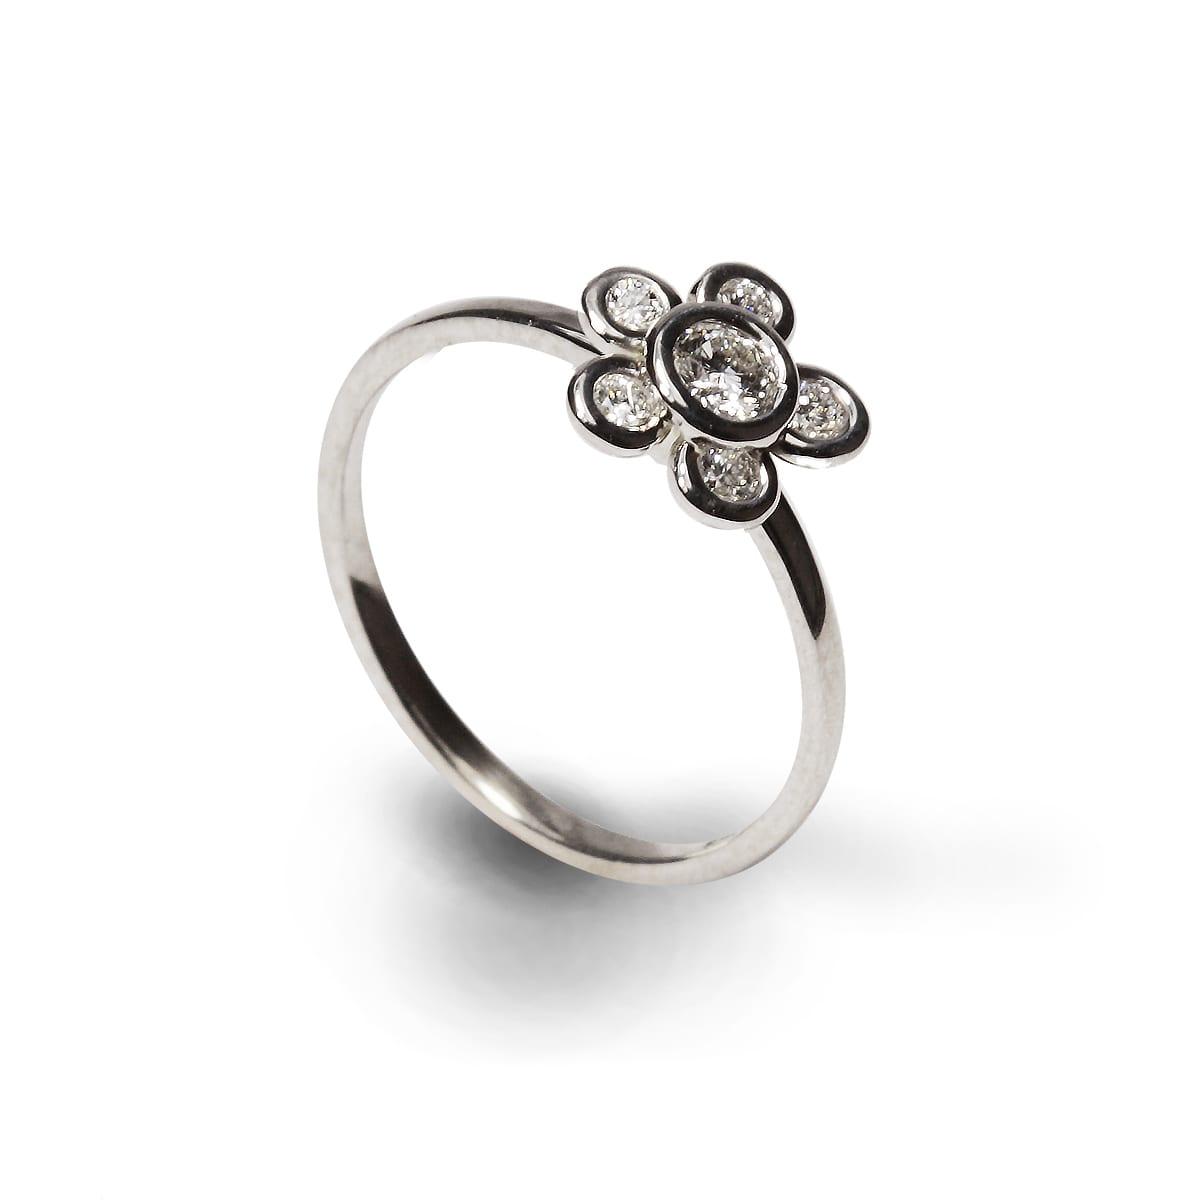 Richters jewelry design studio londonderry new hampshire diamond flower ring mightylinksfo